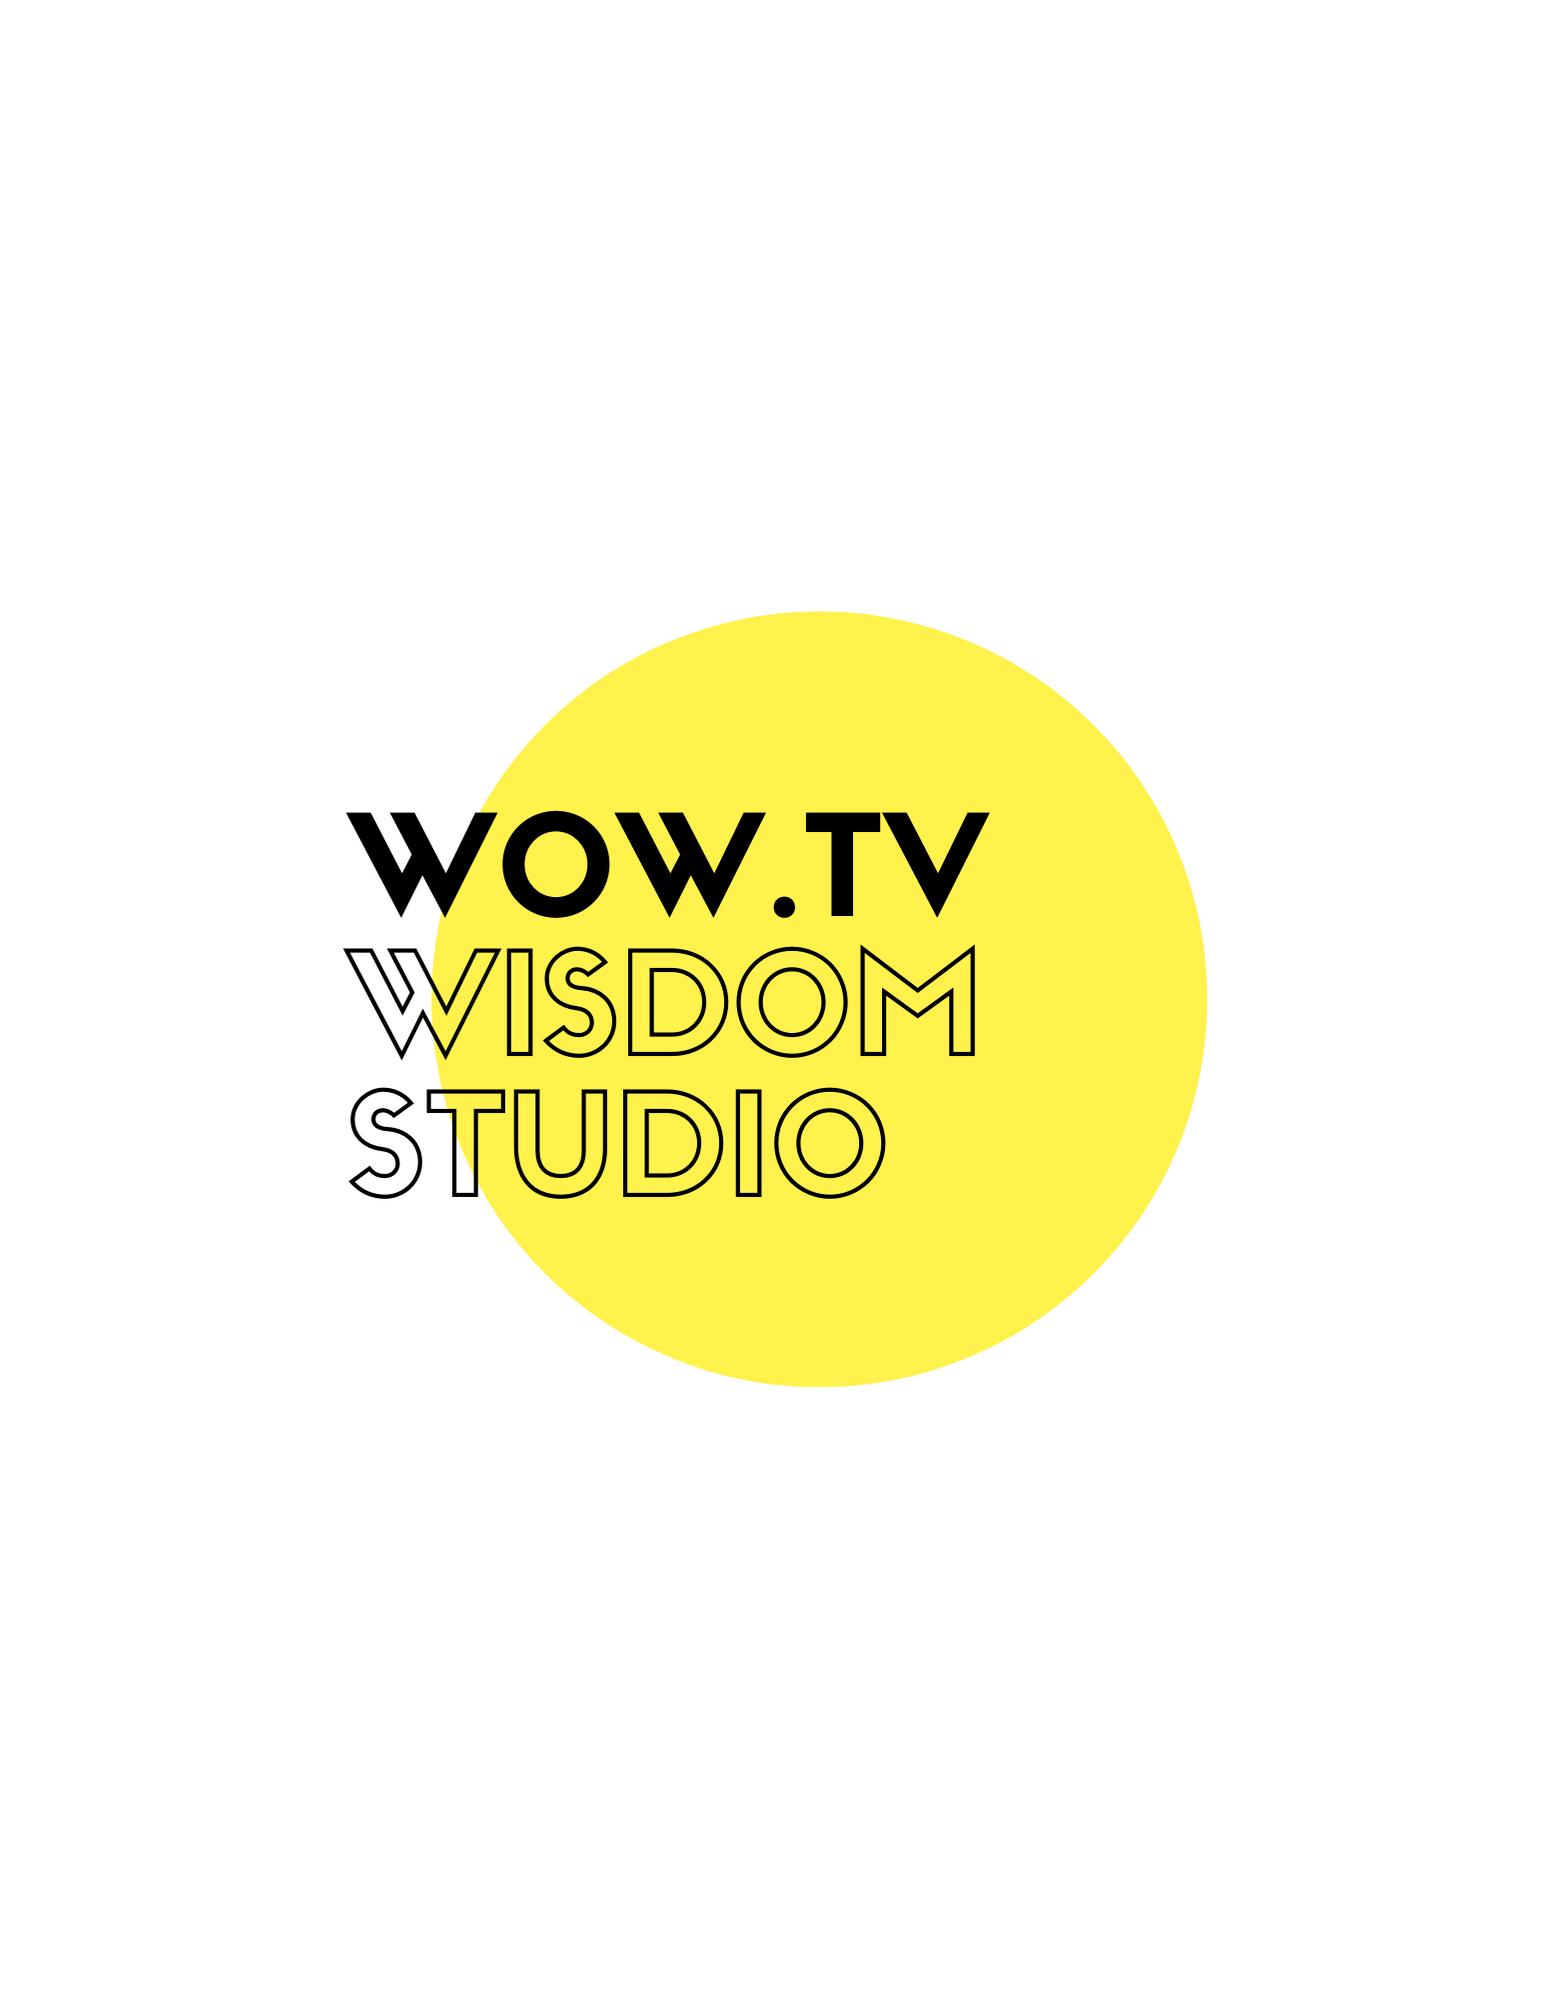 Innovative logo and graphic designer